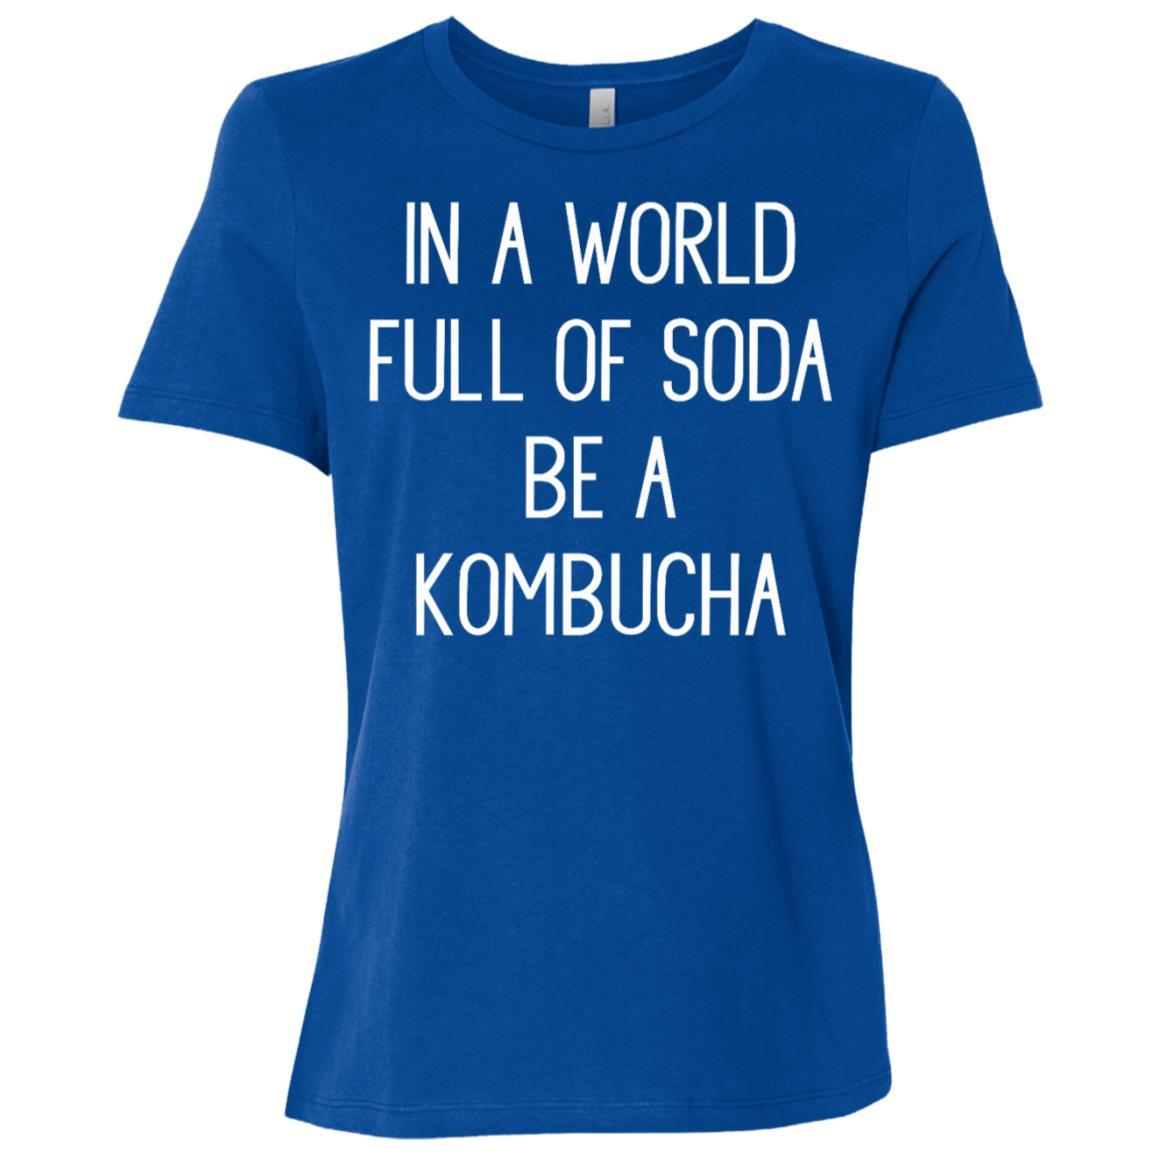 In A World Full Of Soda Be A Kombucha Women Short Sleeve T-Shirt